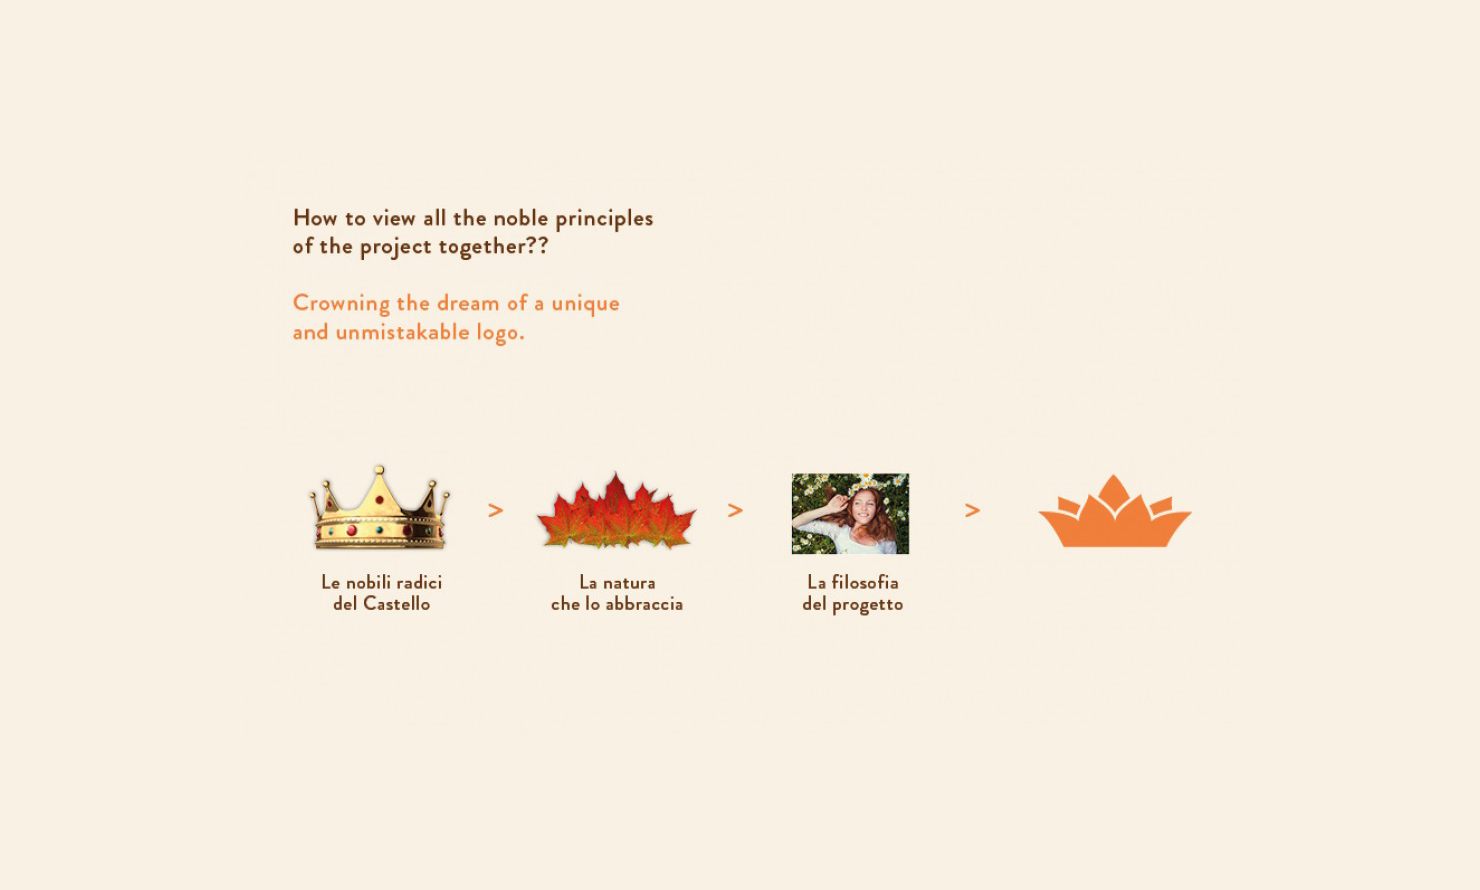 https://www.kubelibre.com/uploads/Slider-work-tutti-clienti/manital-vistaterra-l-agriparco-che-abbraccia-il-castello-brand-identity-brand-strategy-7.jpg